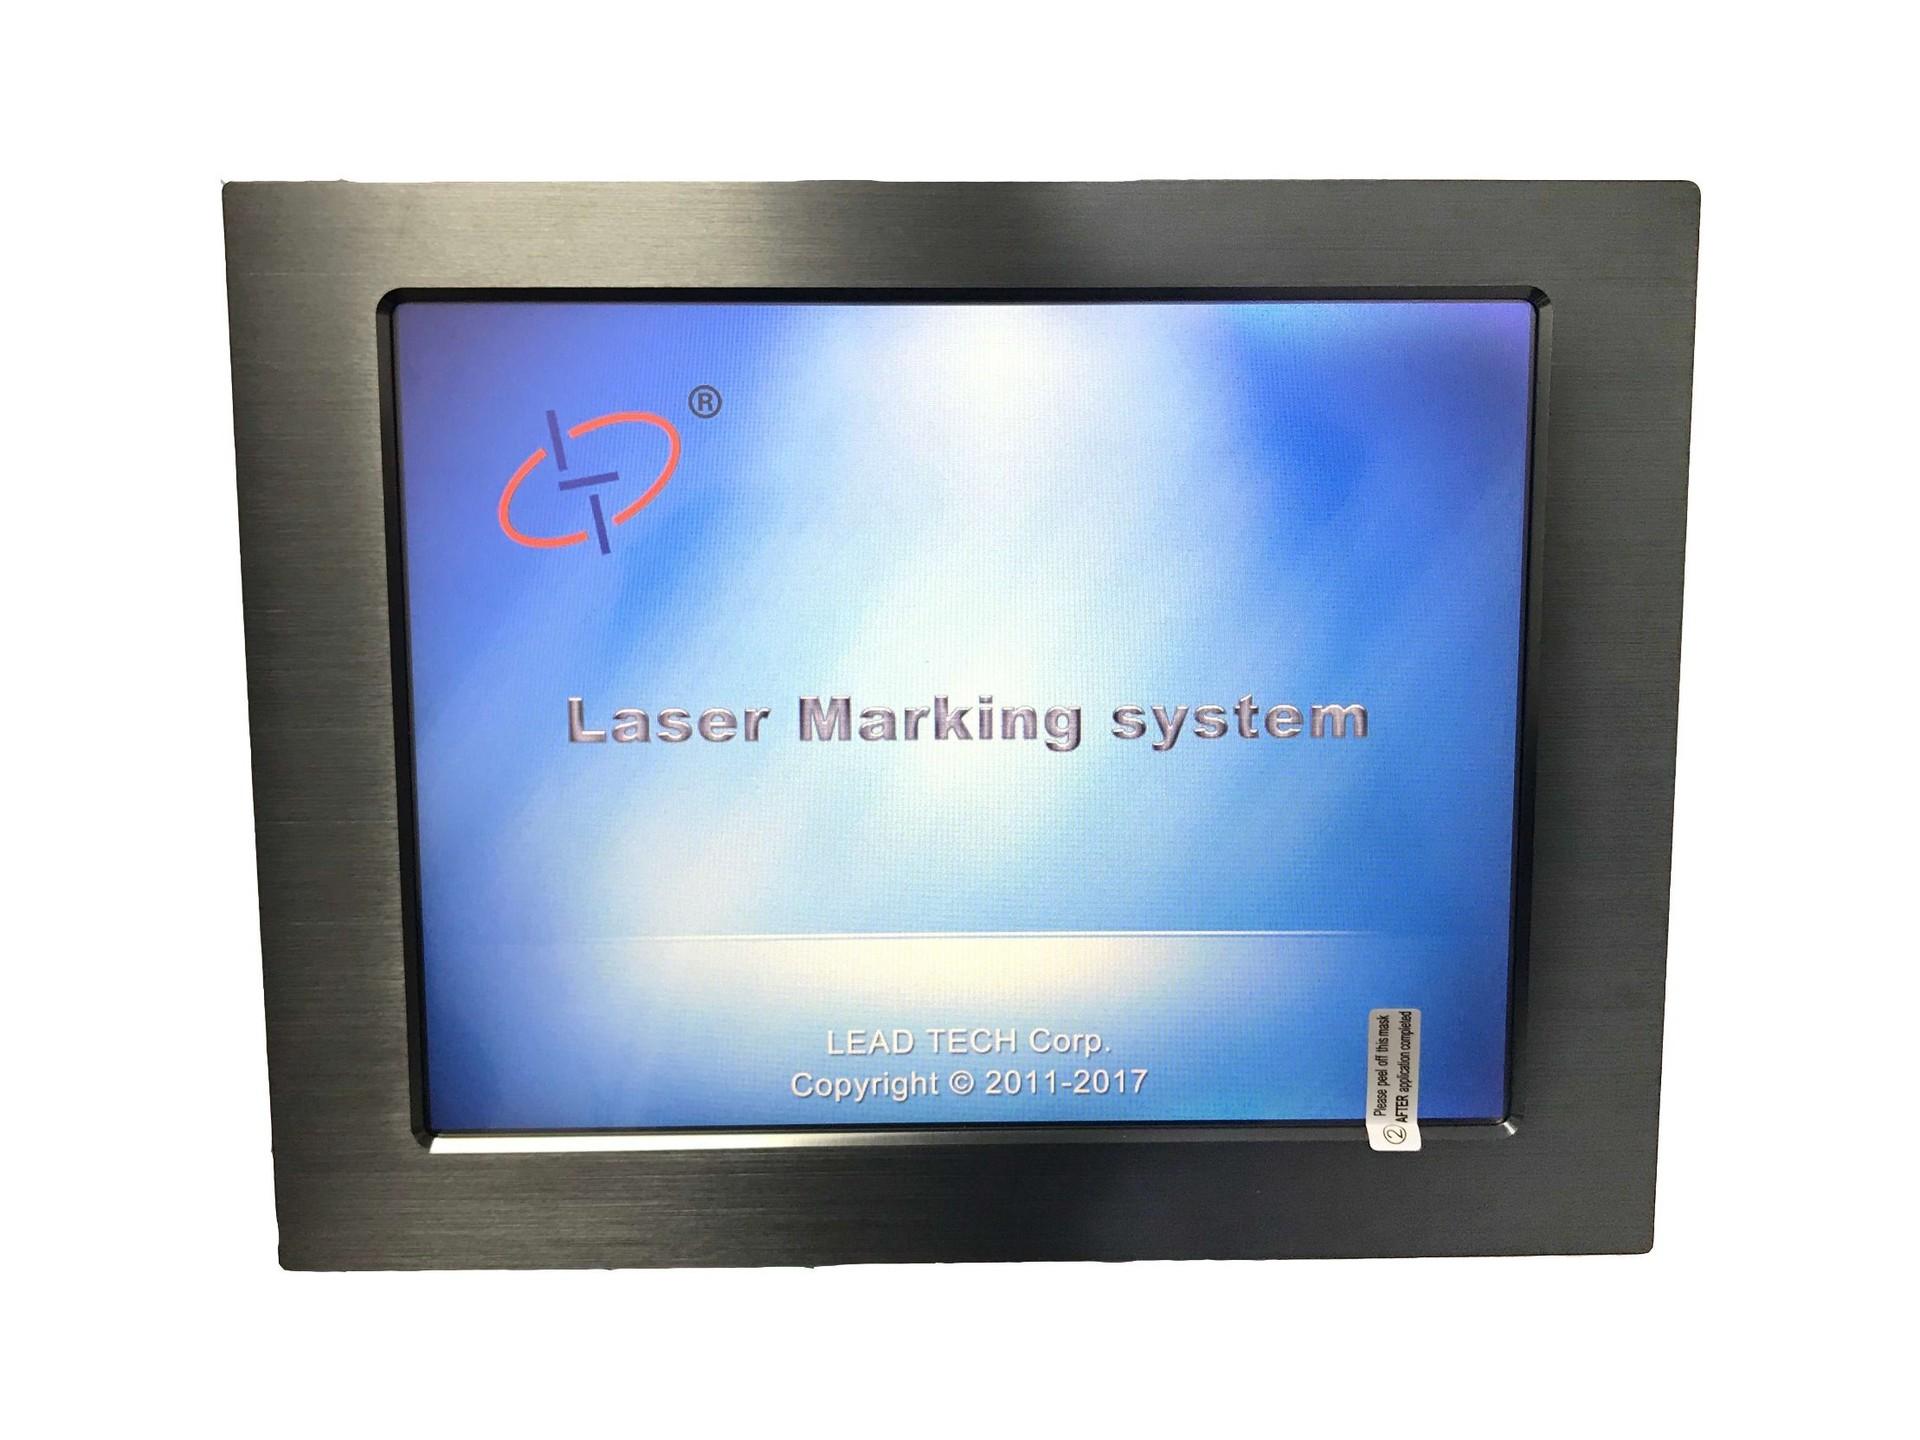 Lt8020c/Lt8030c CO2 High Performance Digital Laser Marking Printer for Stainless Steel Metal